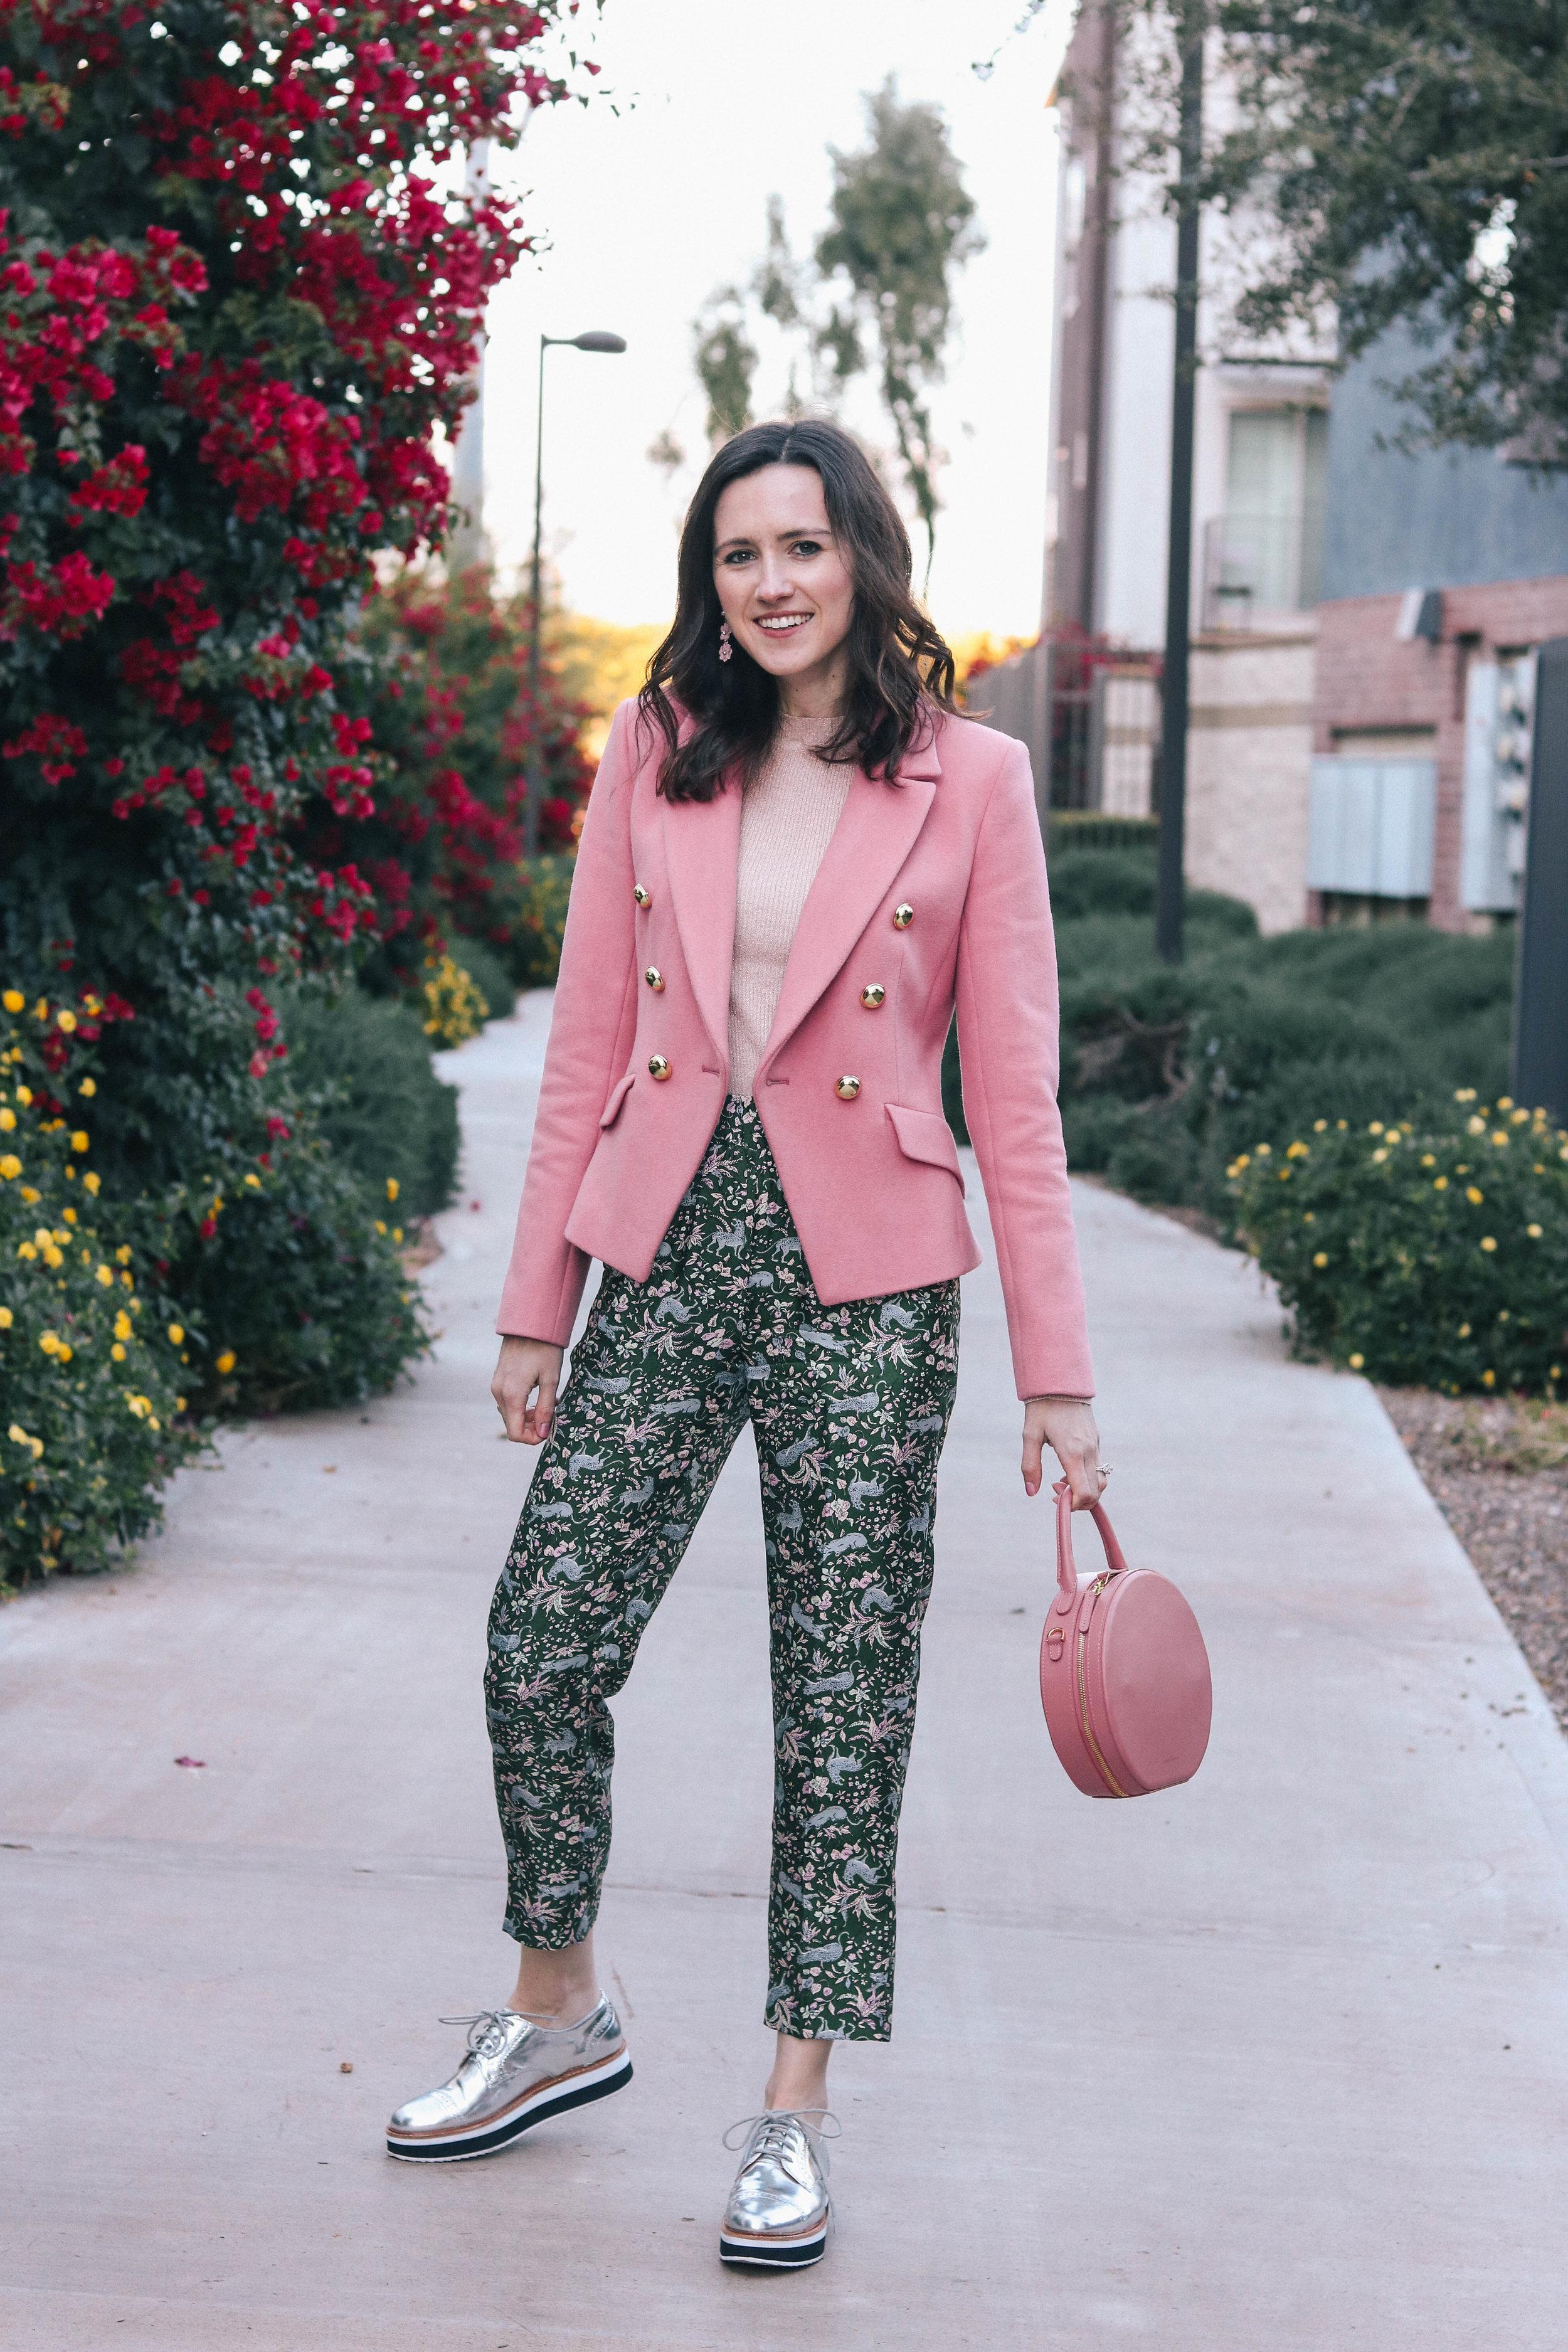 bb-pink-green-florals-002 (1 of 1).jpg